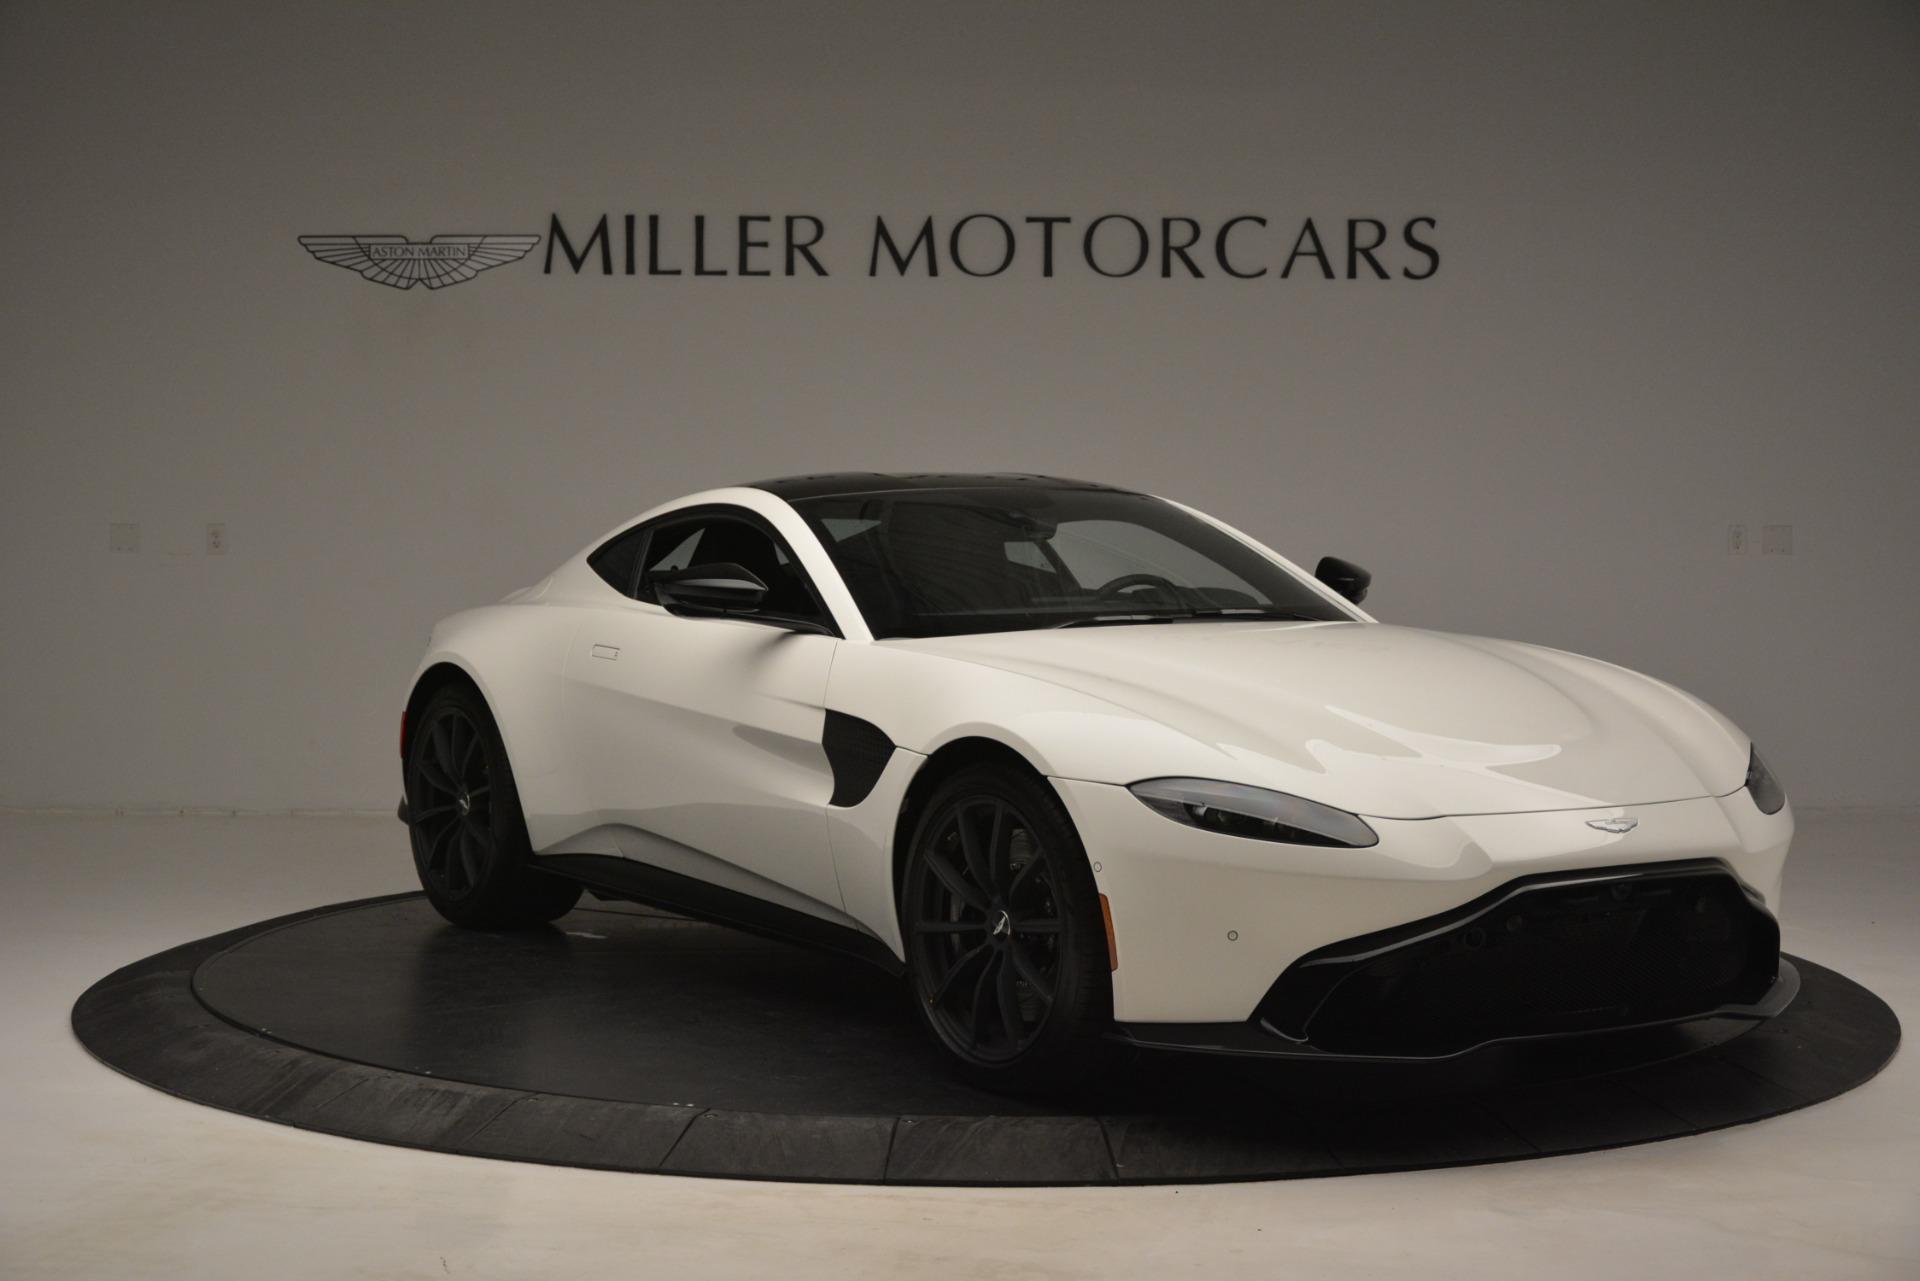 New 2019 Aston Martin Vantage  For Sale In Greenwich, CT 3053_p11